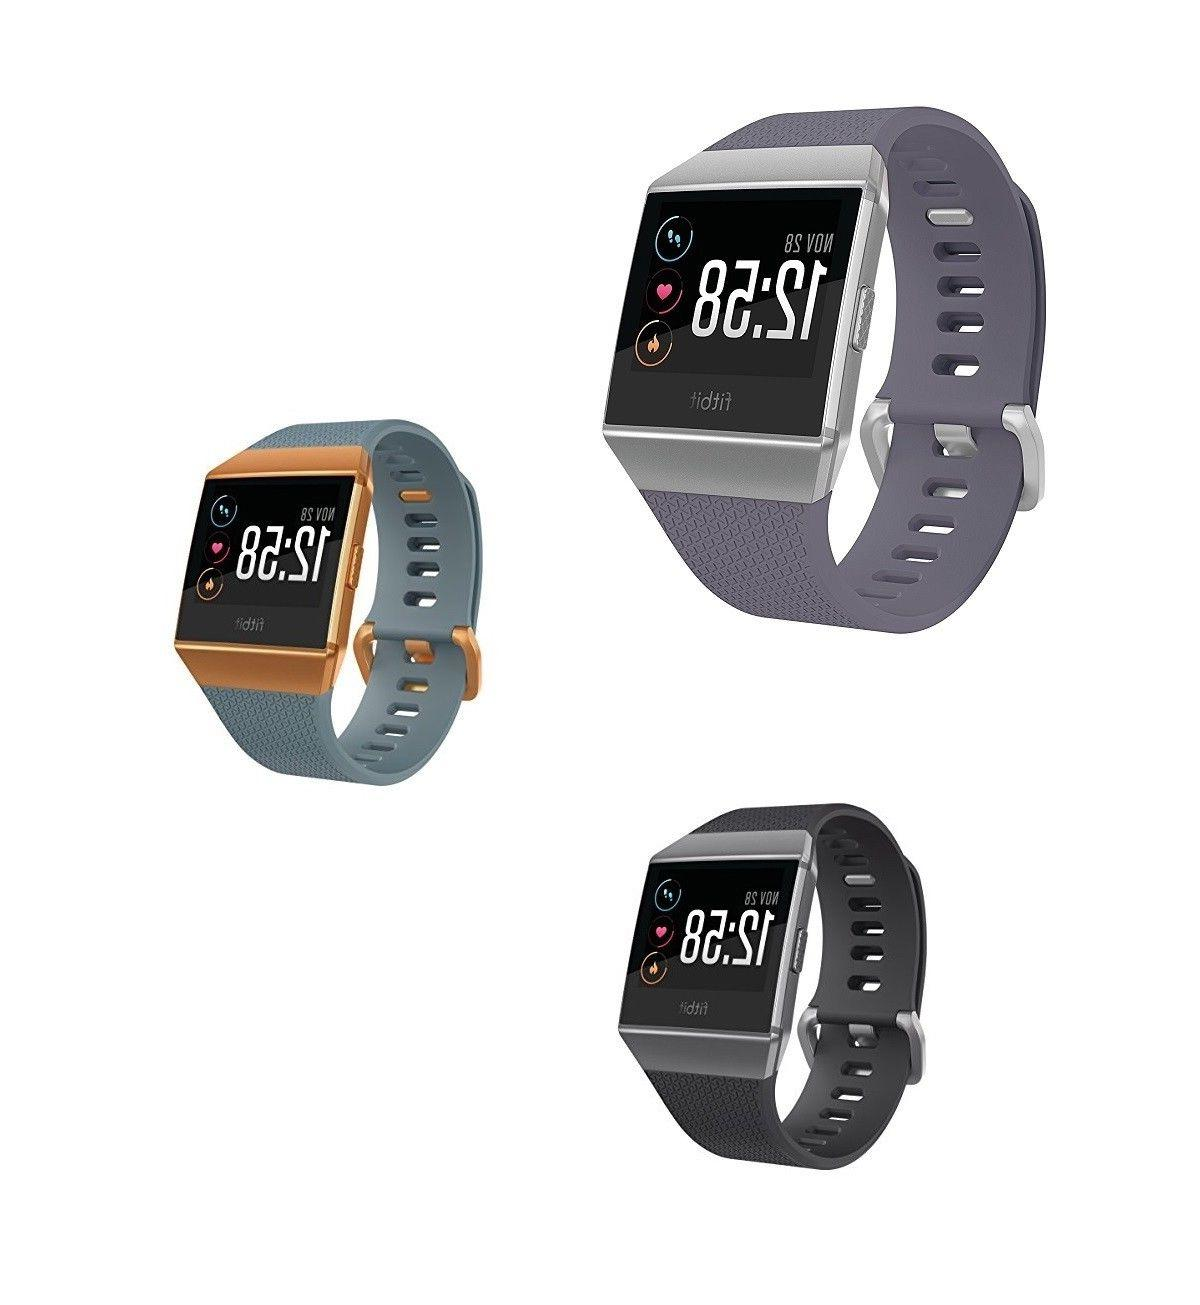 new ionic smart fitness watch wireless bluetooth